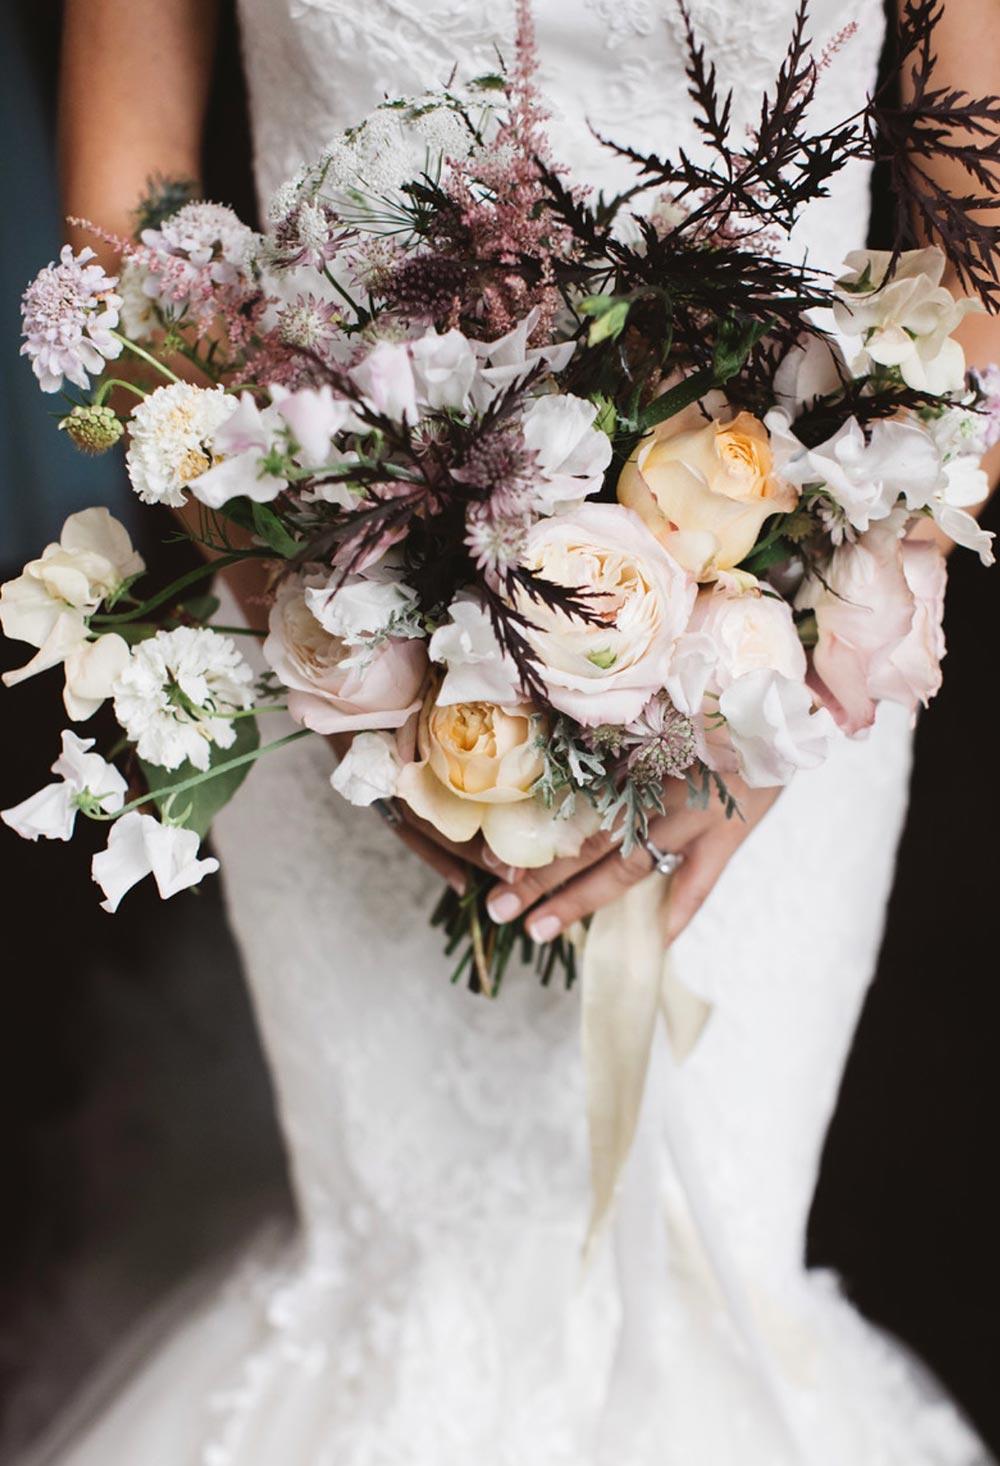 18-wilde-thyme-bridal-bouquet-wedding-fowers-garden-roses--silk-ribbon.jpg